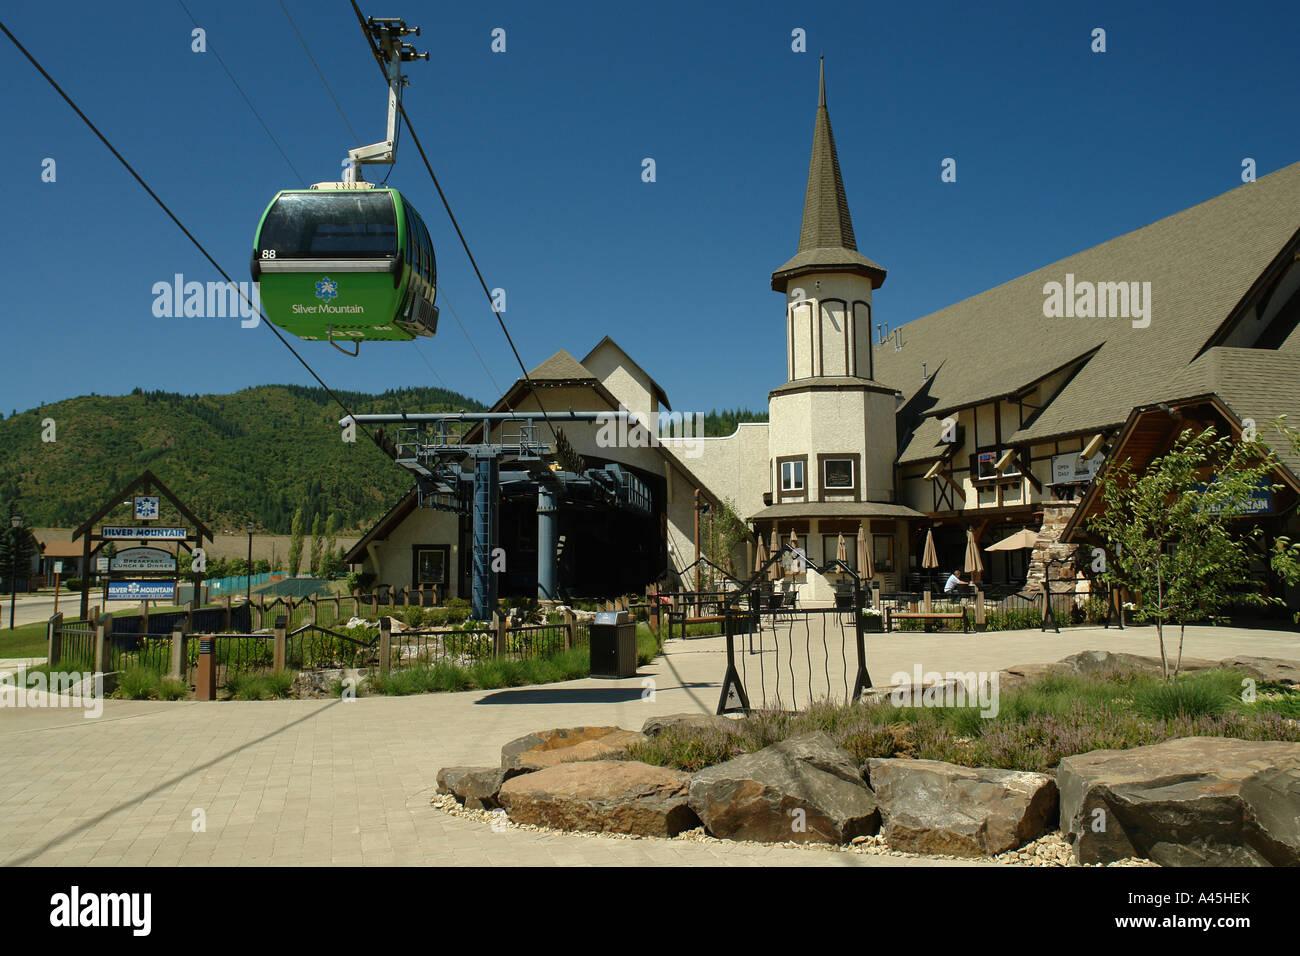 ajd56282, kellogg, id, idaho, silver mountain resort, gondola stock